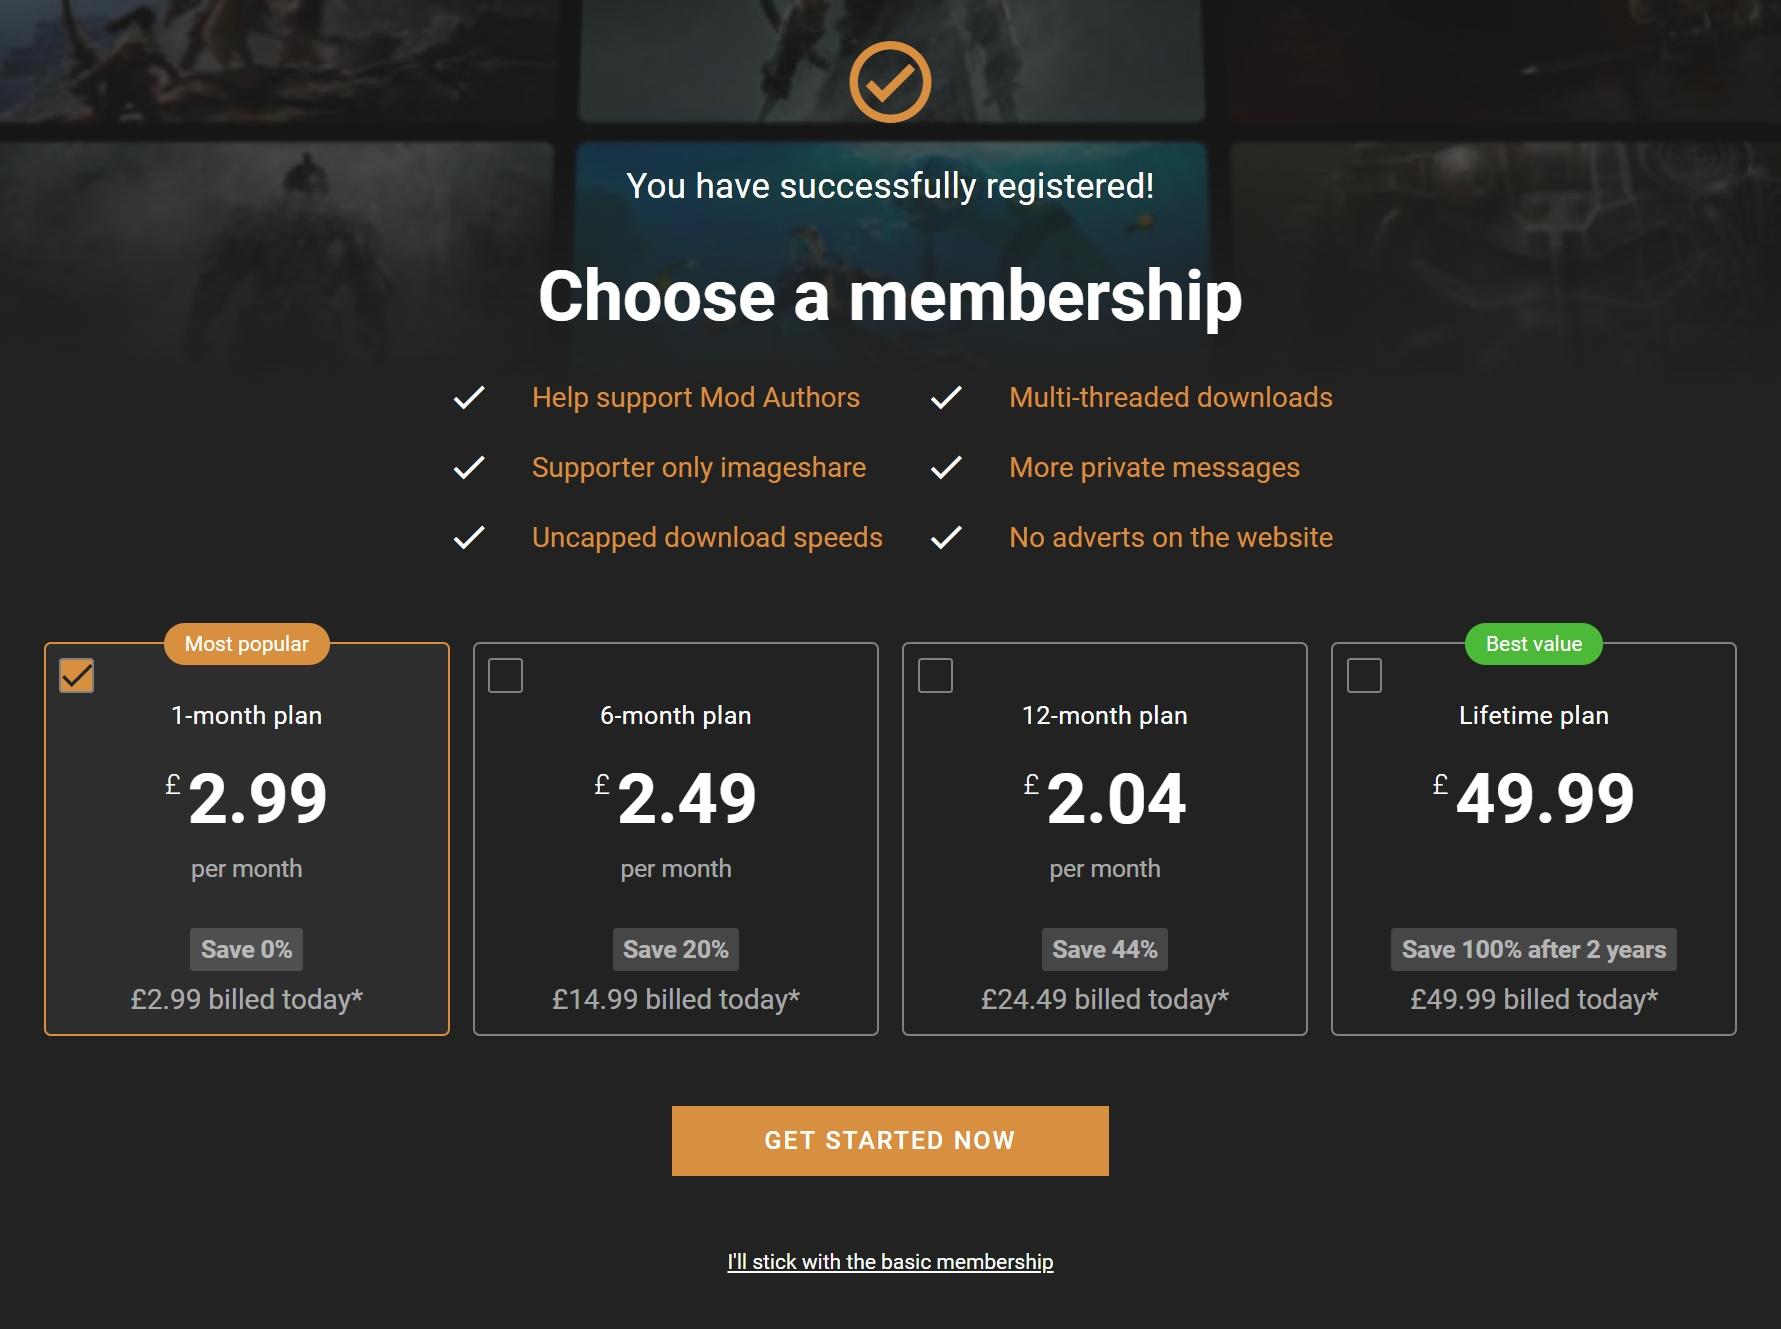 NEXUS_MODS-ユーザーメンバーシップ価格情報